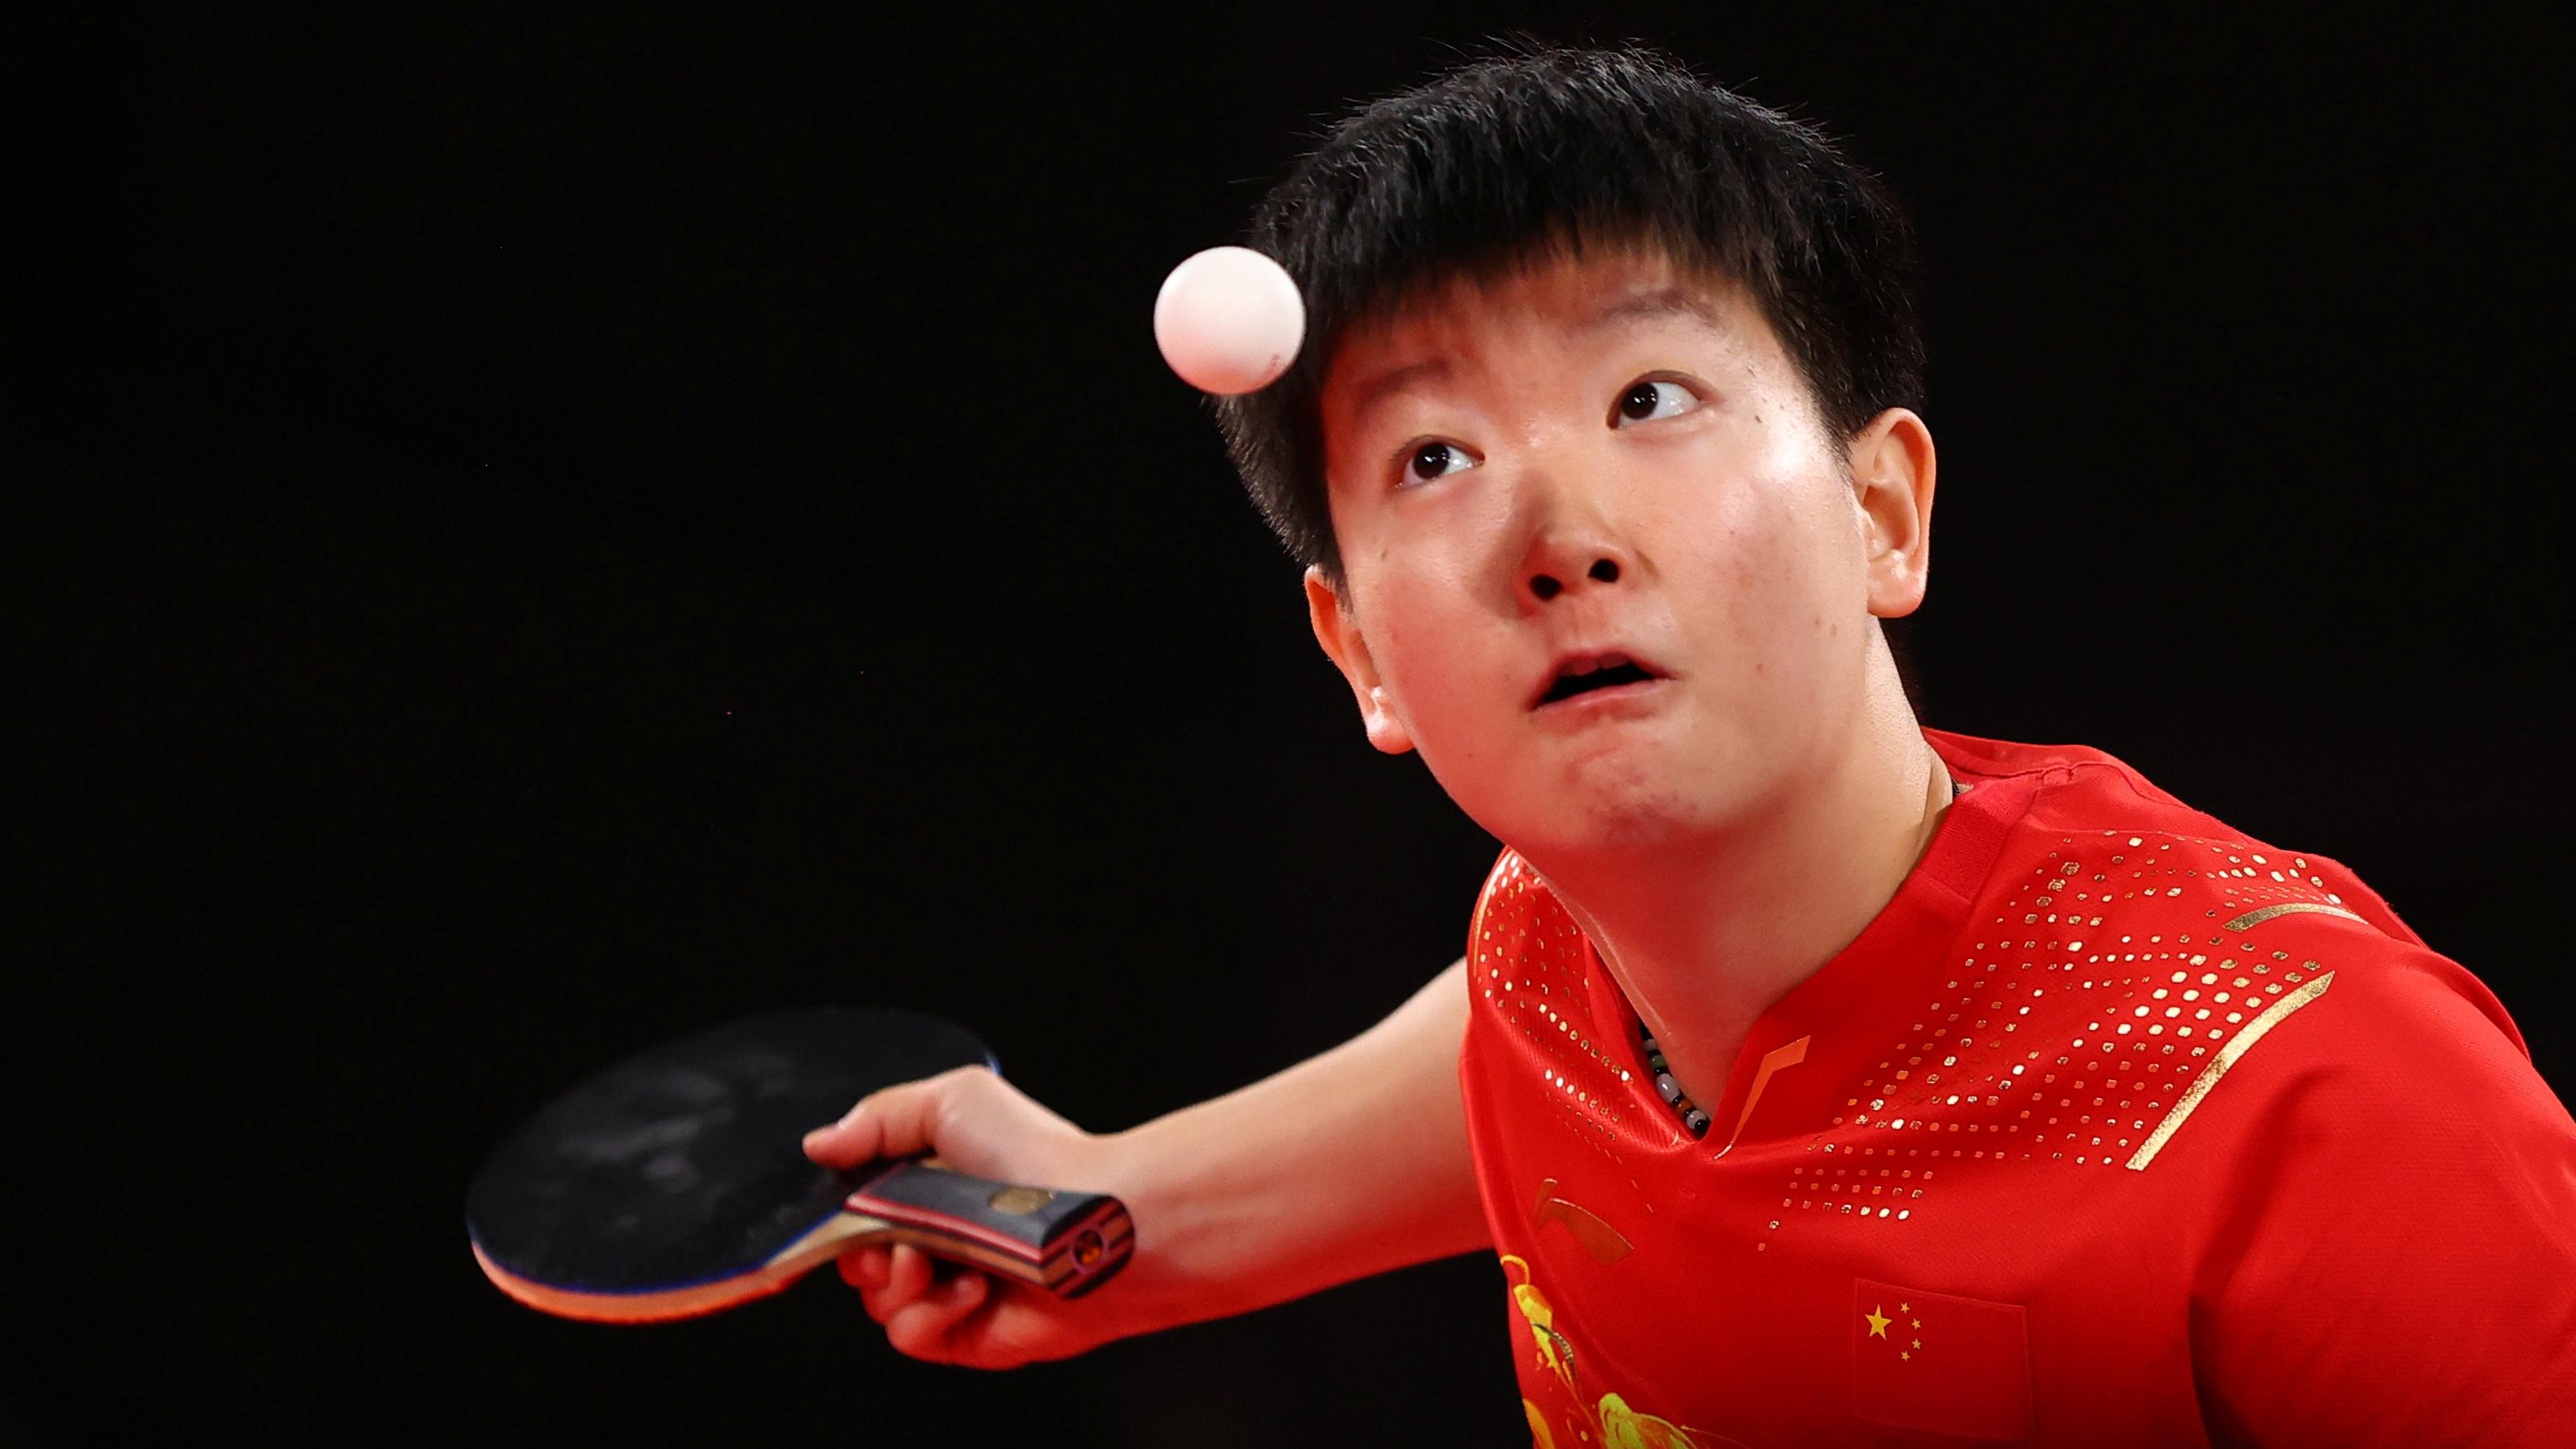 Tokyo 2020 Olympics - Table Tennis - Women's Singles - Semifinal - Tokyo Metropolitan Gymnasium - Tokyo, Japan - July 29, 2021.  Sun Yingsha of China in action against Mima Ito of Japan REUTERS/Thomas Peter